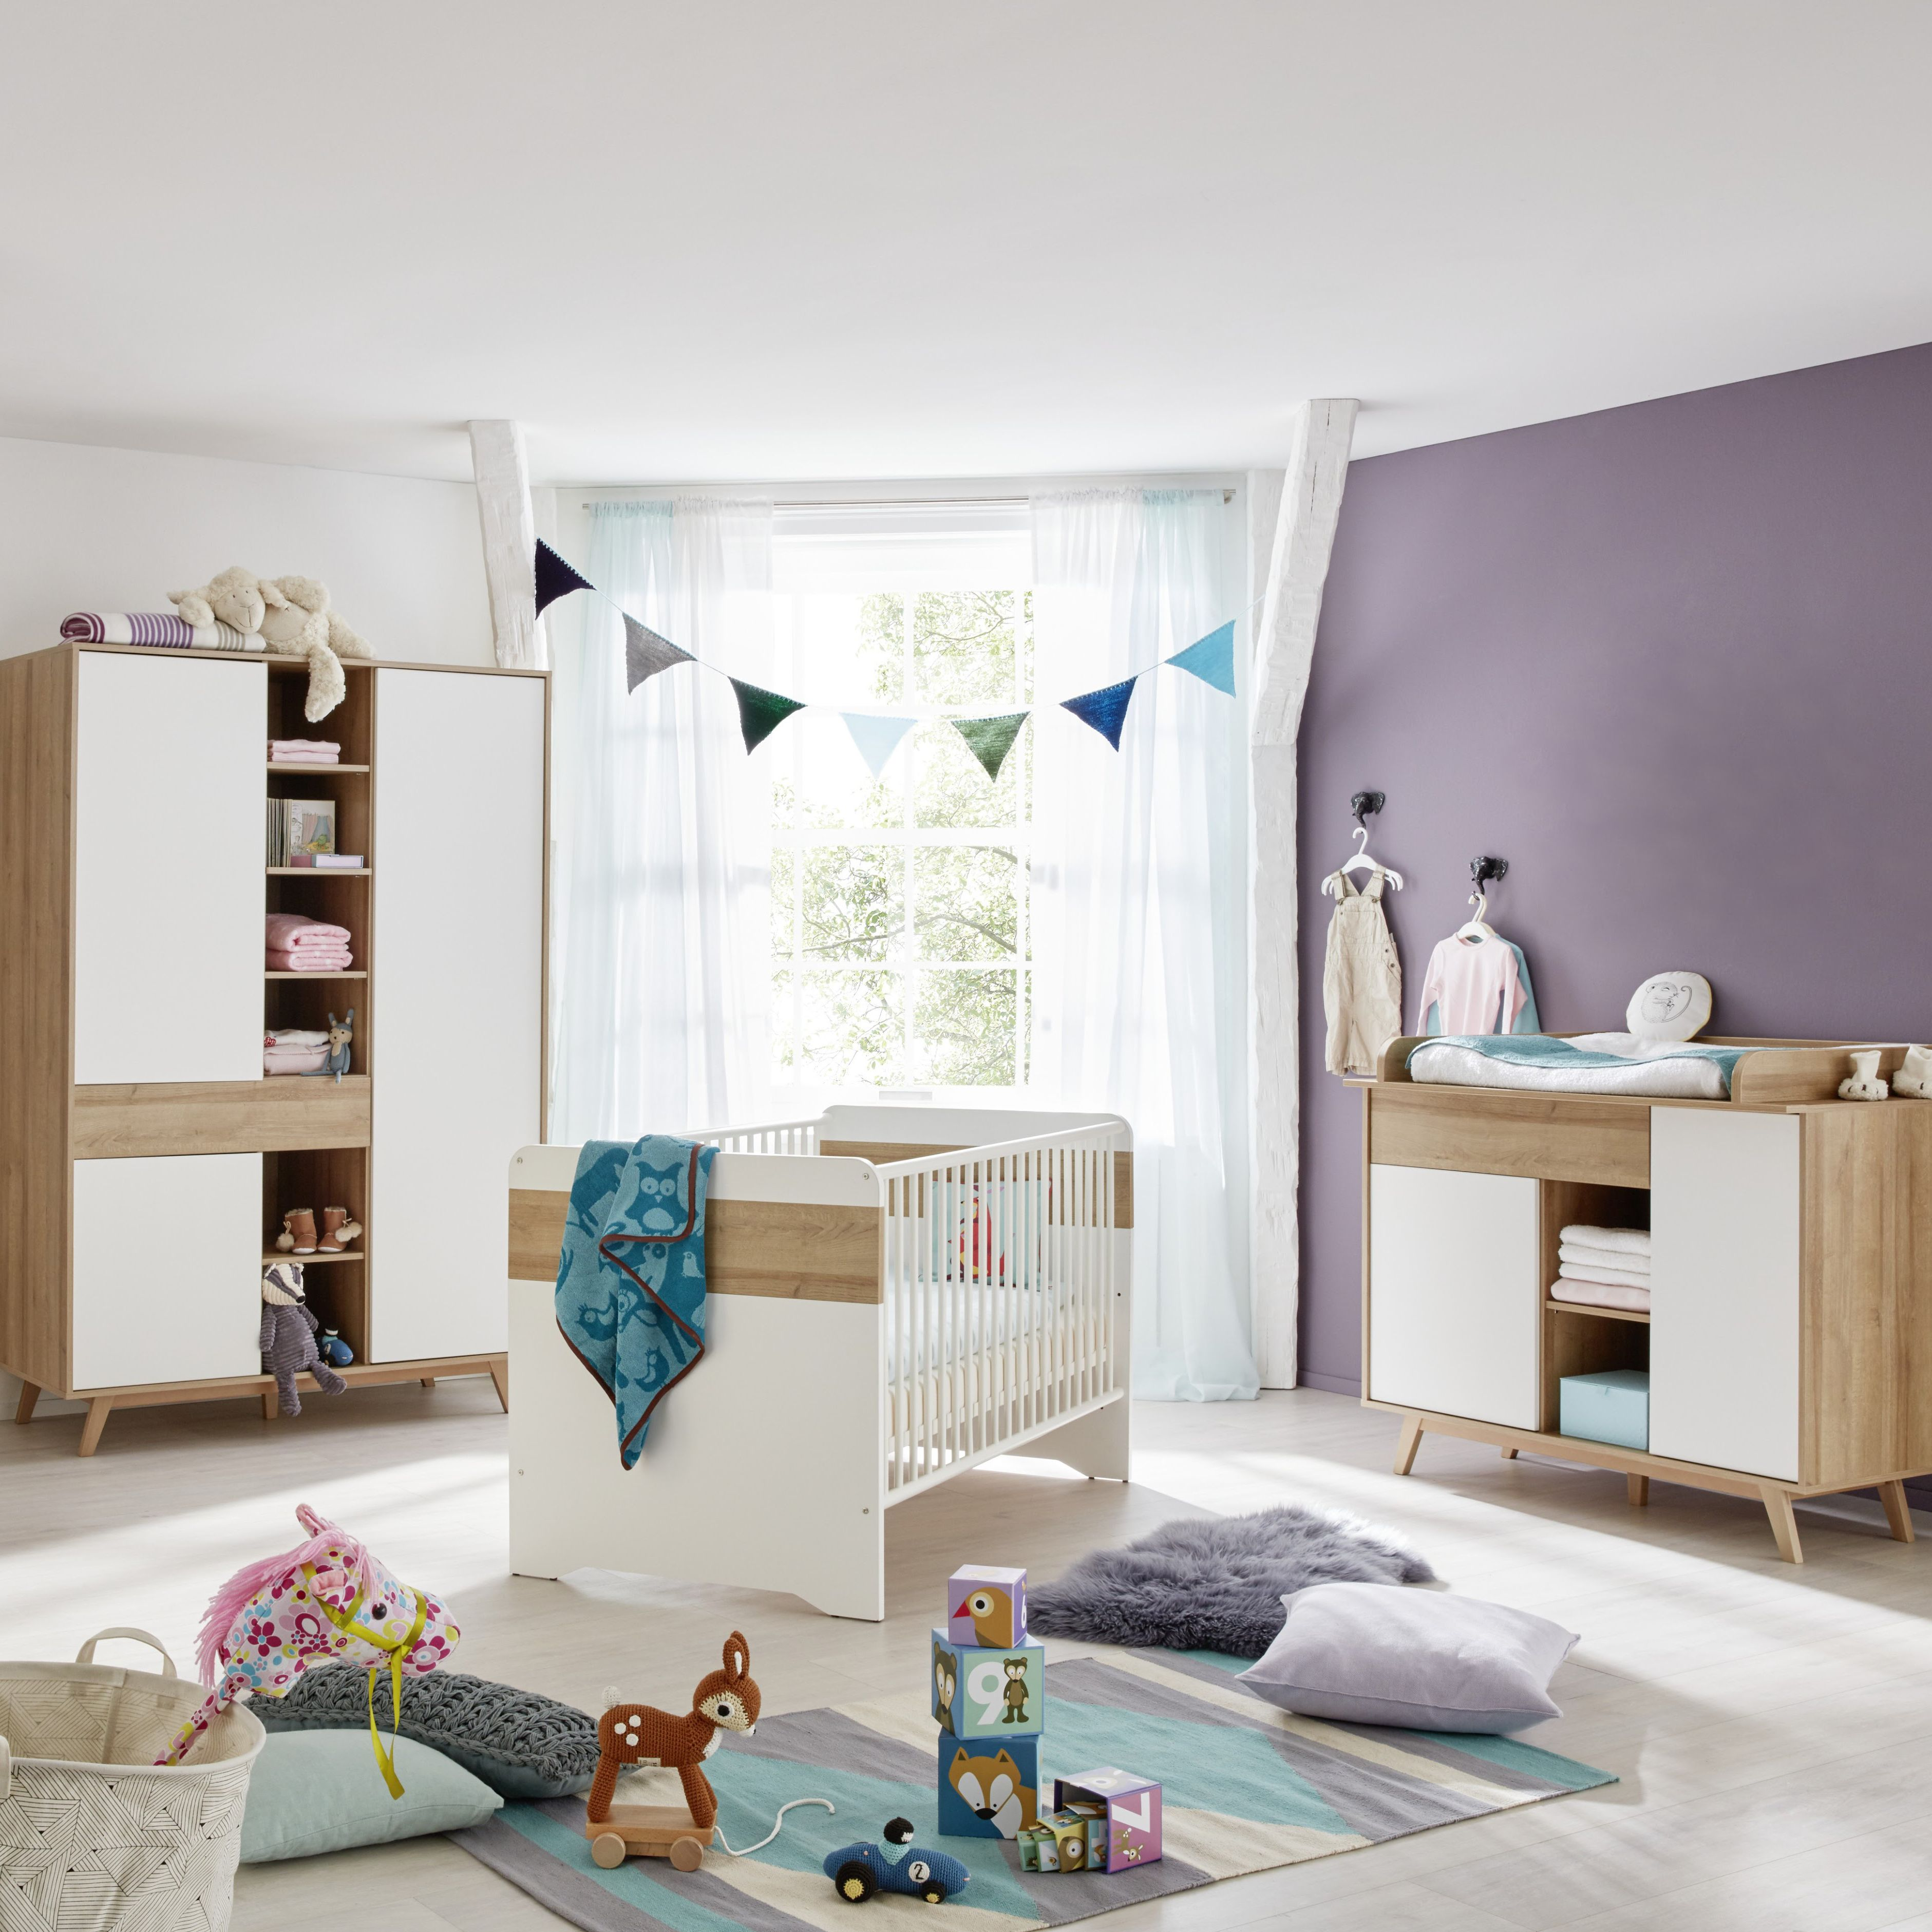 babyzimmer komplettset stockfotos bild oder cdbbfcabbe